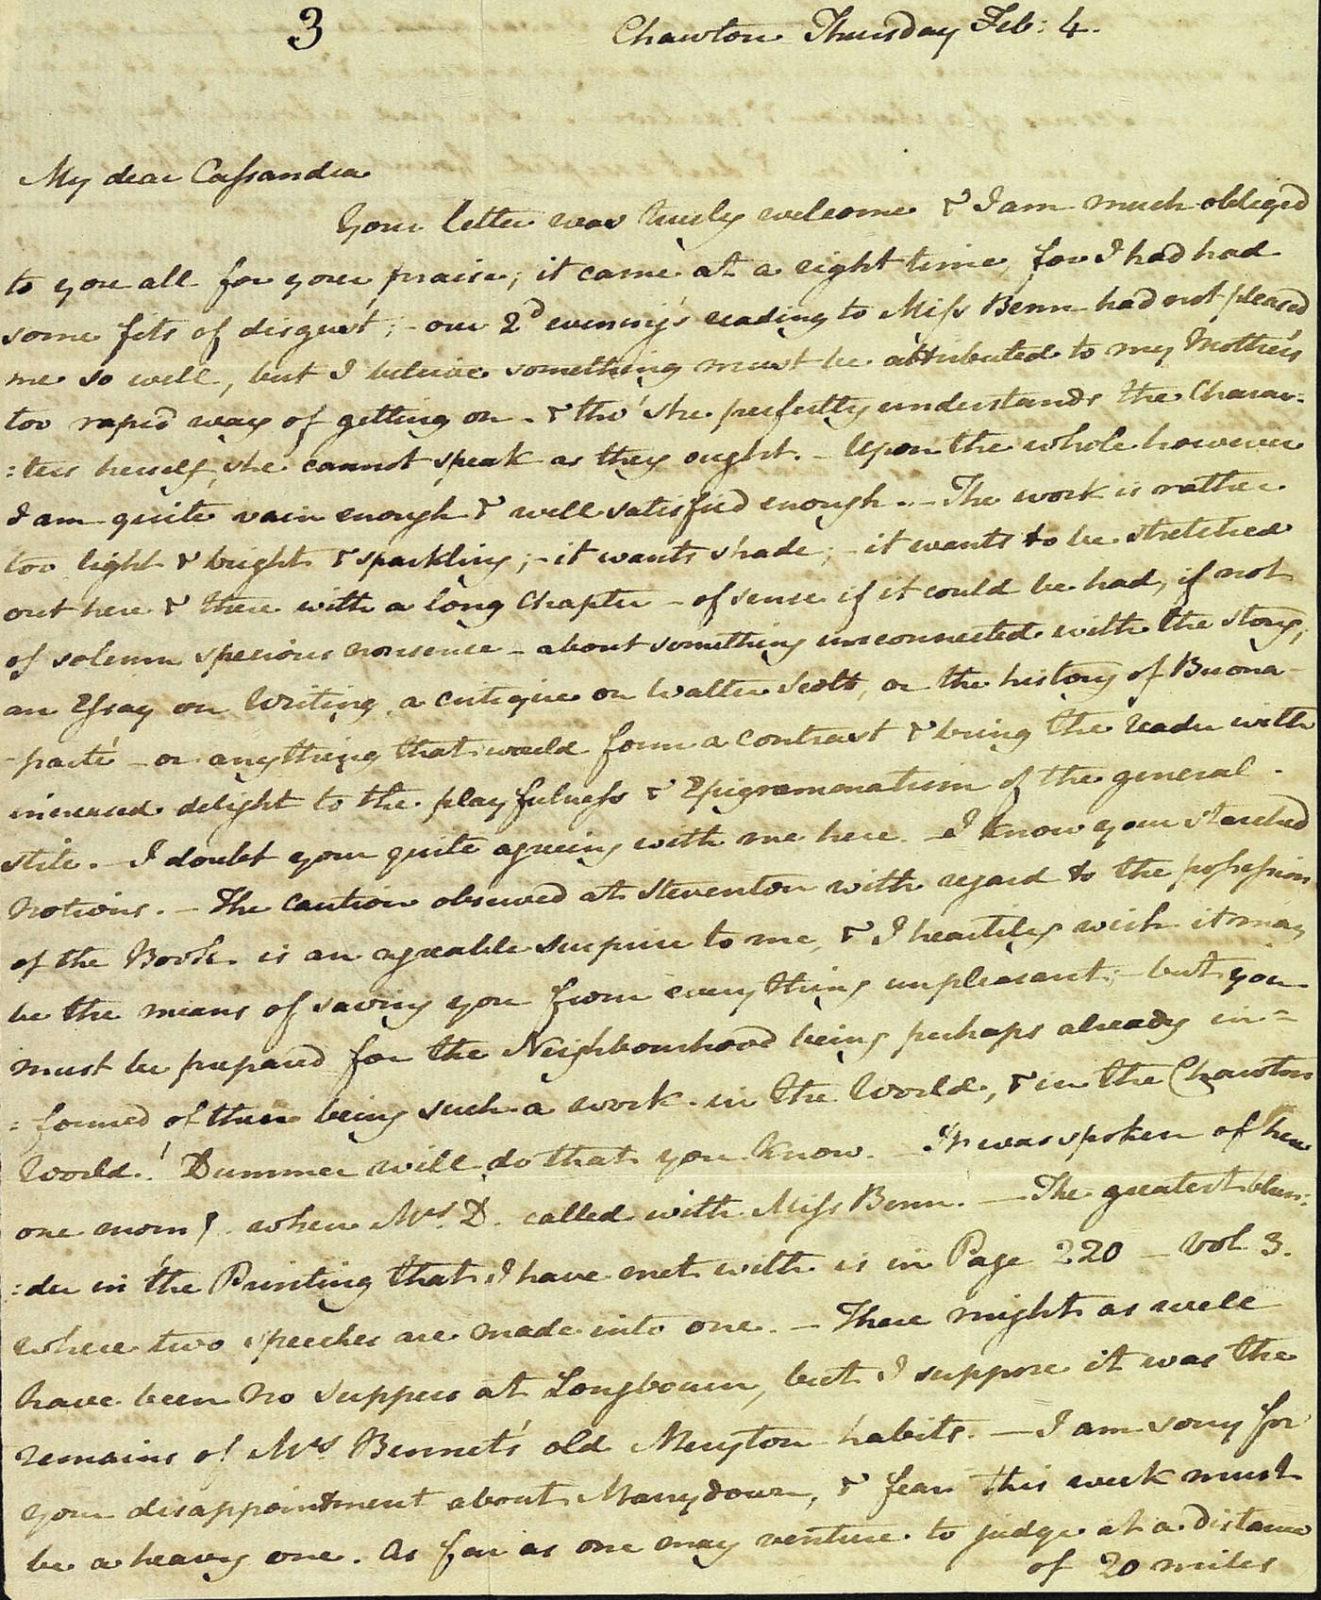 Letter from Jane Austen to Cassandra Austen, 4 February 1813. Page 1